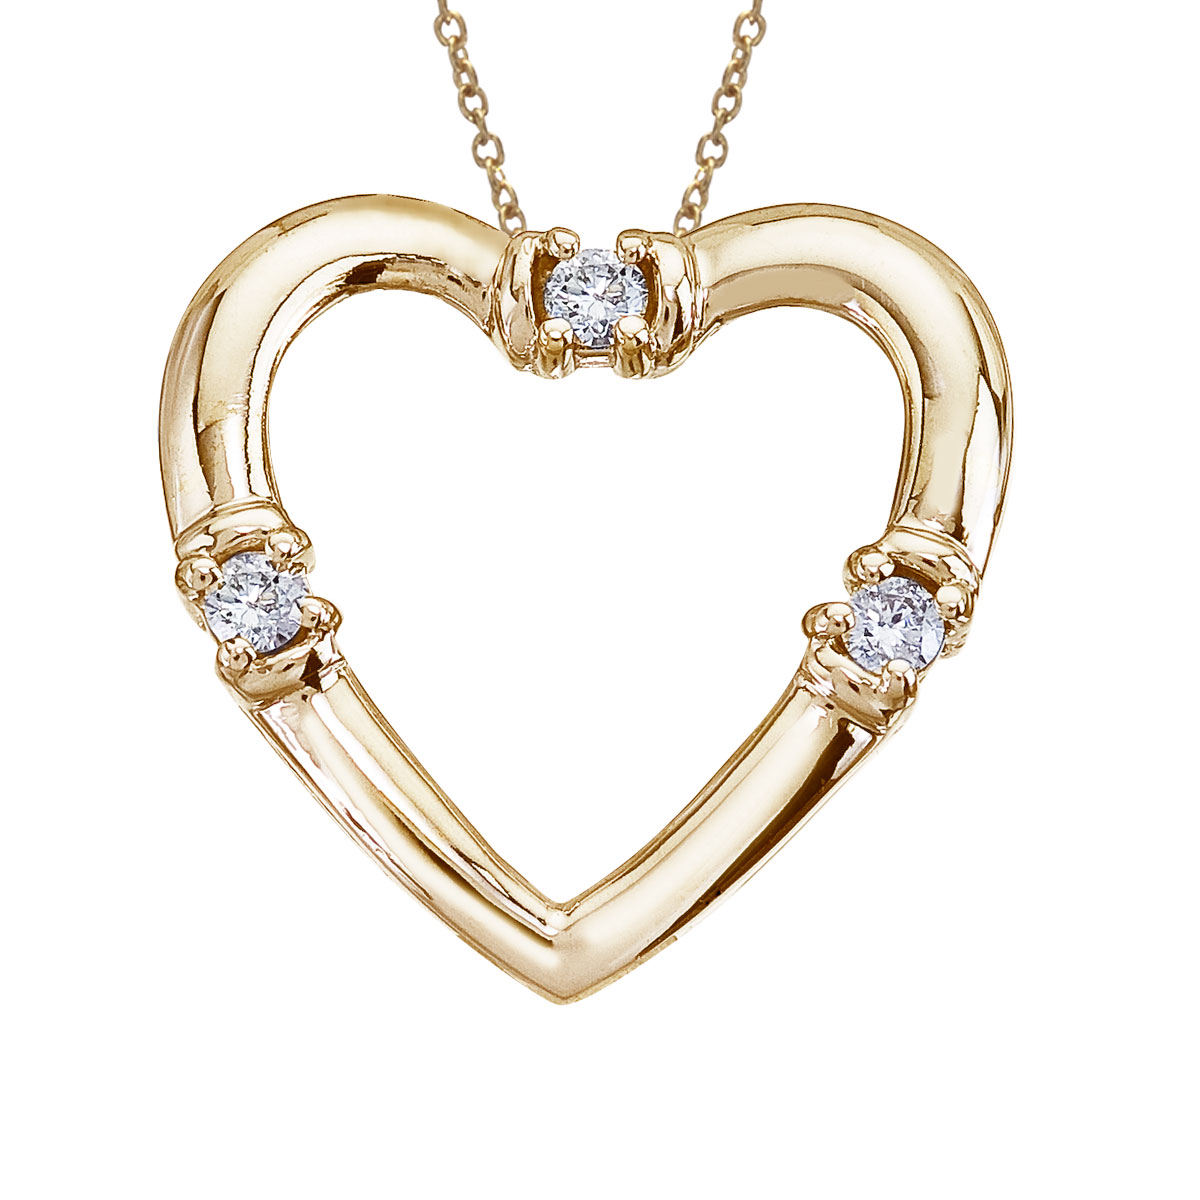 14K Yellow Gold and Diamond Open Heart Pendant